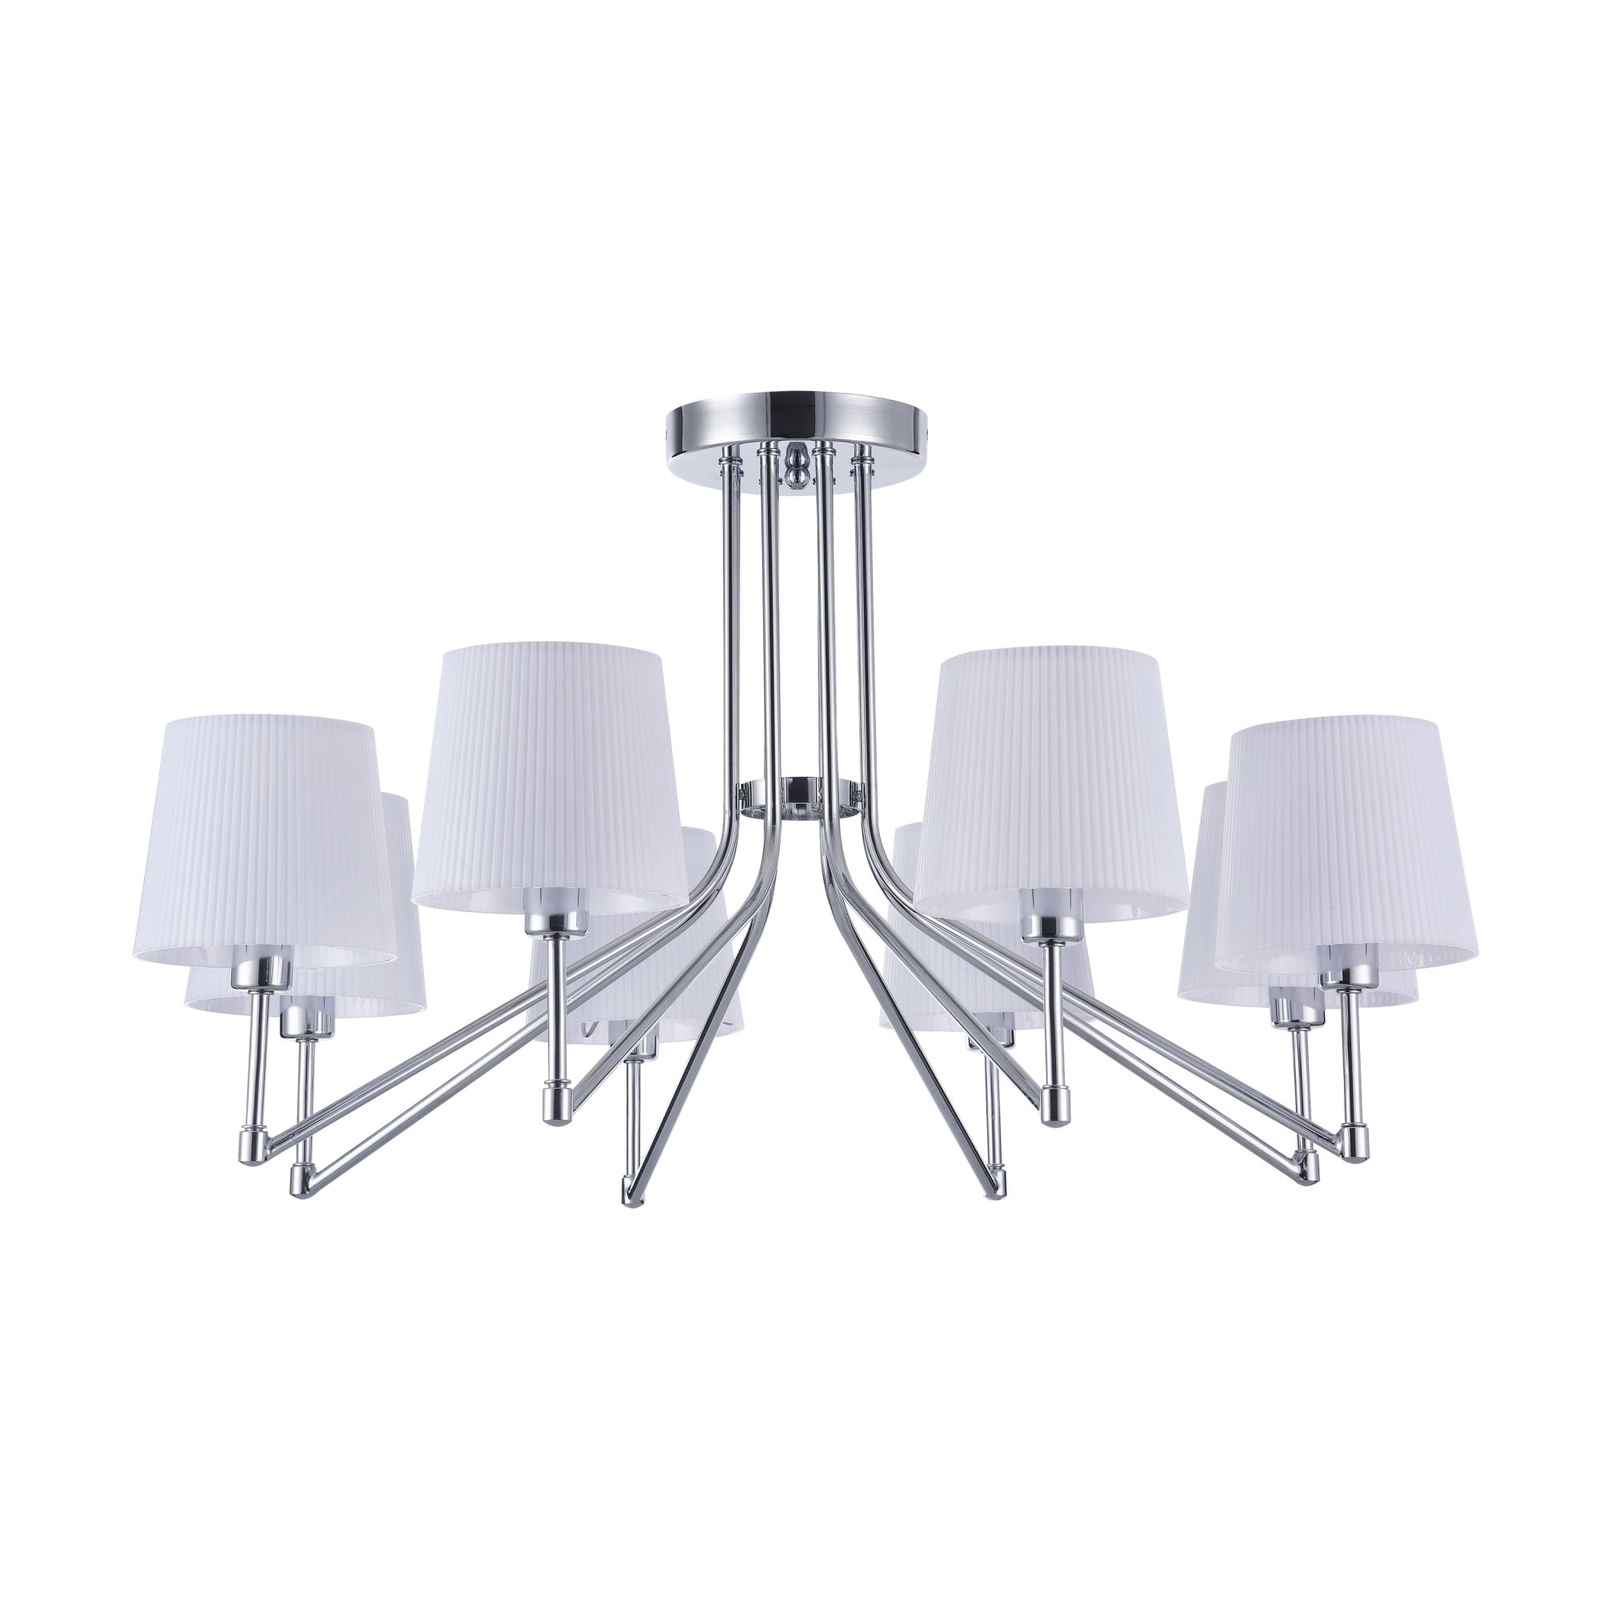 Потолочный светильник Freya FR5051-CL-08-CH люстра freya freya fr5051 cl 08 ch